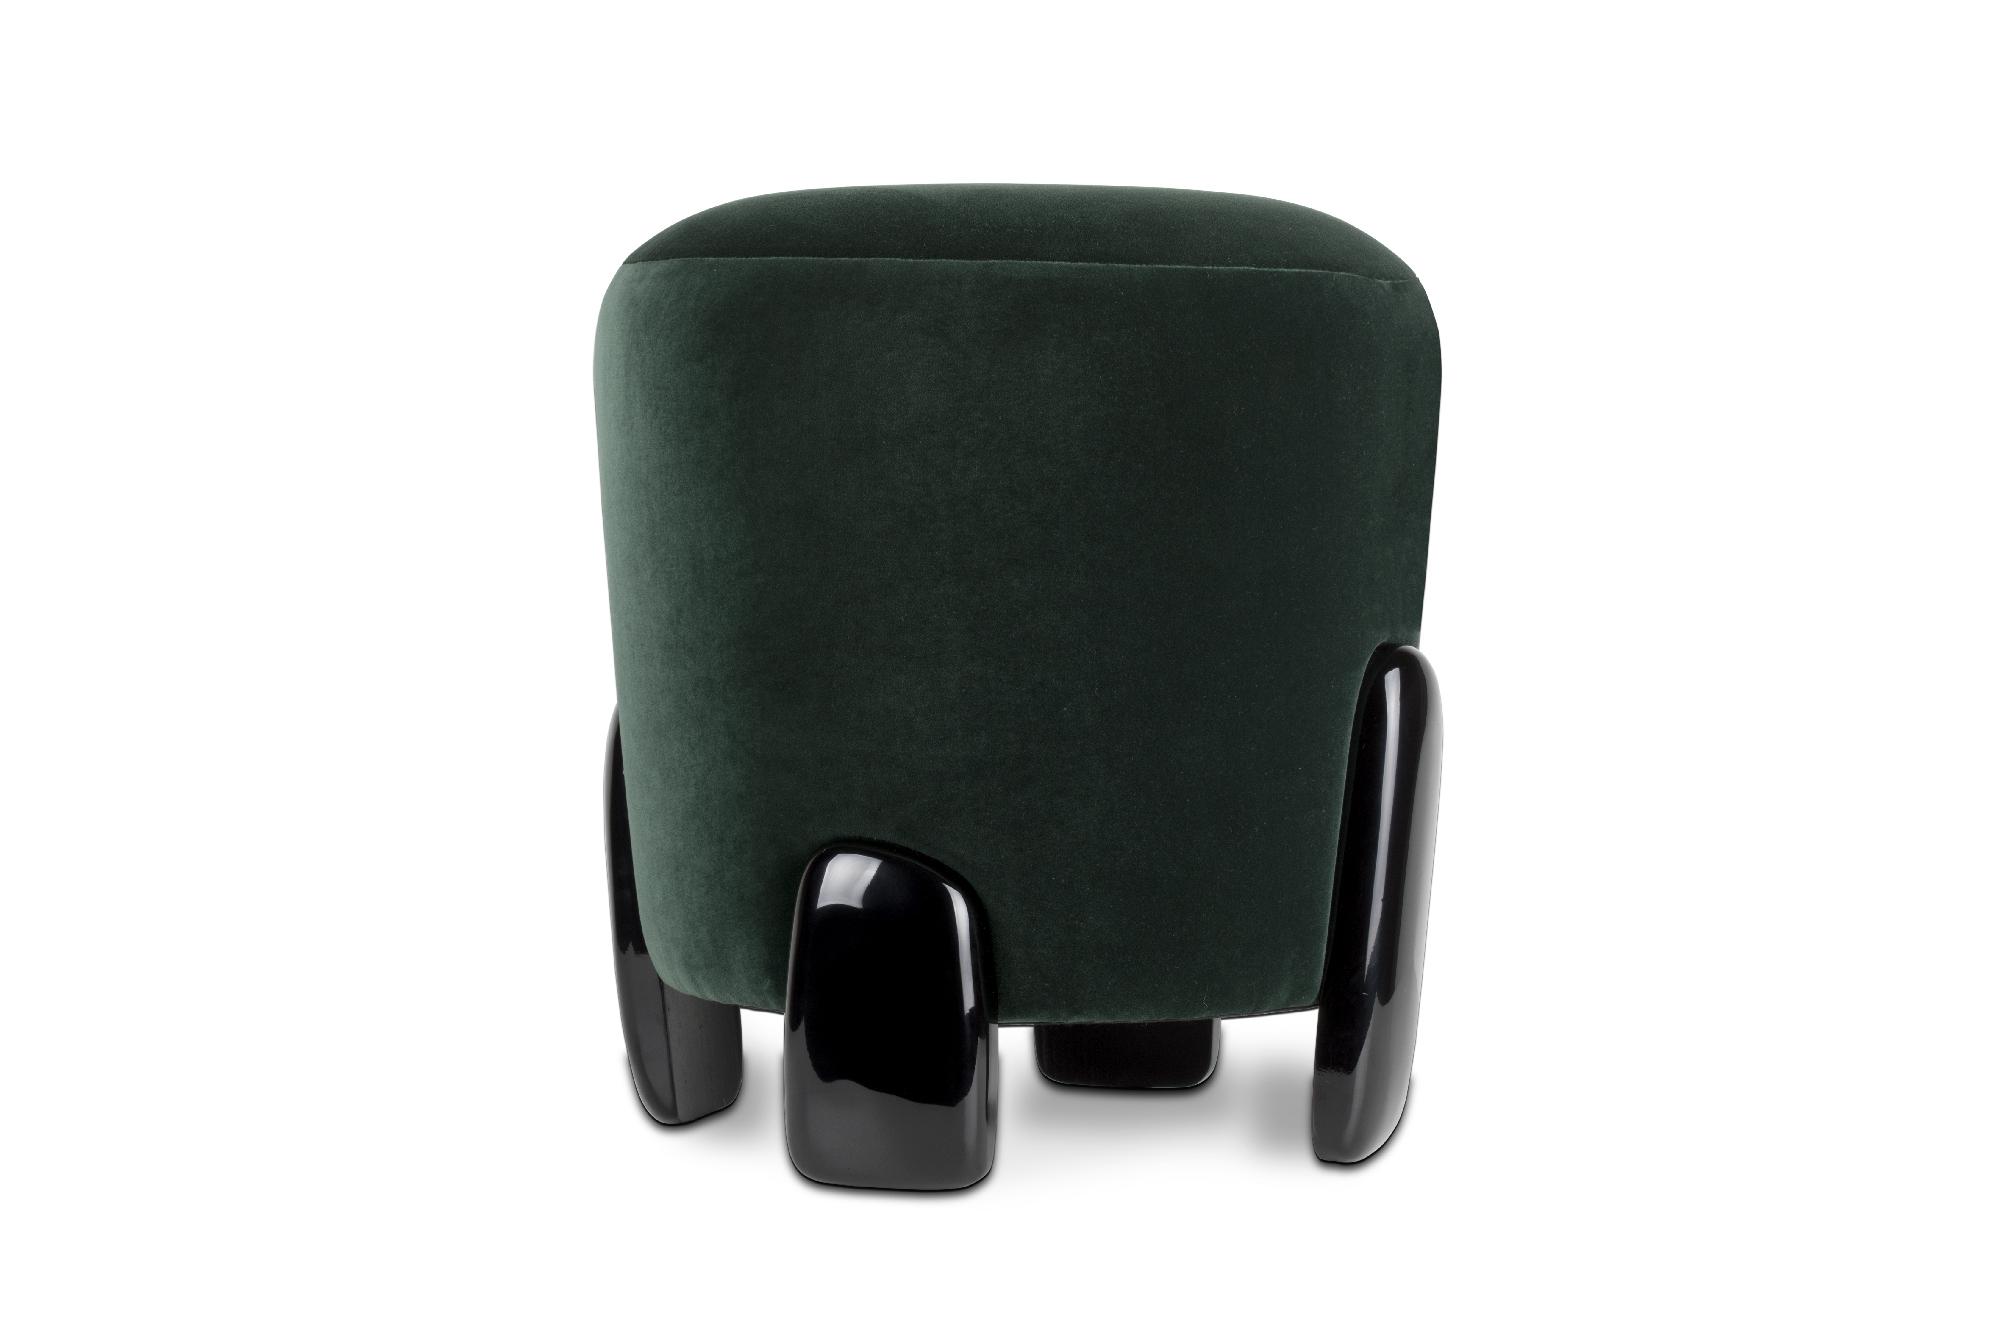 Modern Style Upholstered Fabrics by BRABBU NOAKI STOOL modern style Modern Style Upholstered Fabrics by BRABBU Modern Style Upholstered Fabrics by BRABBU NOAKI STOOL